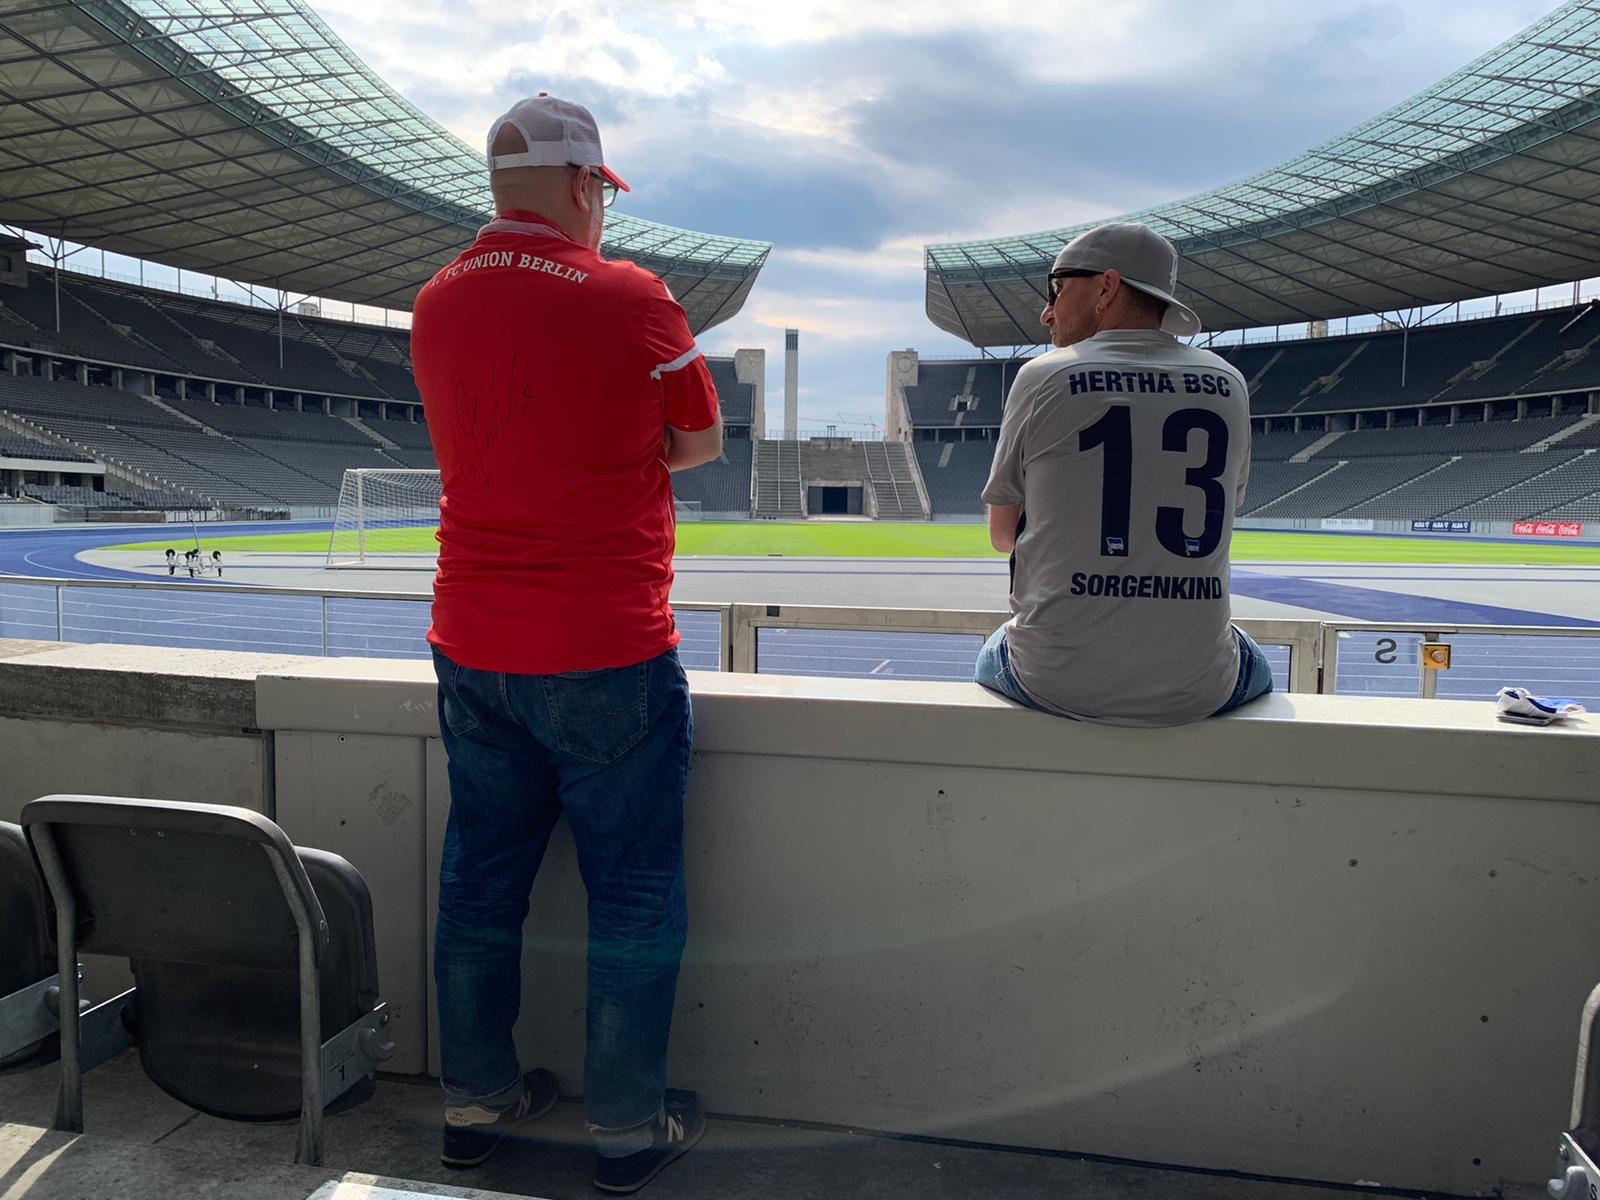 Andi und Matthias im Olympiastadion, Foto via @aro_conaro